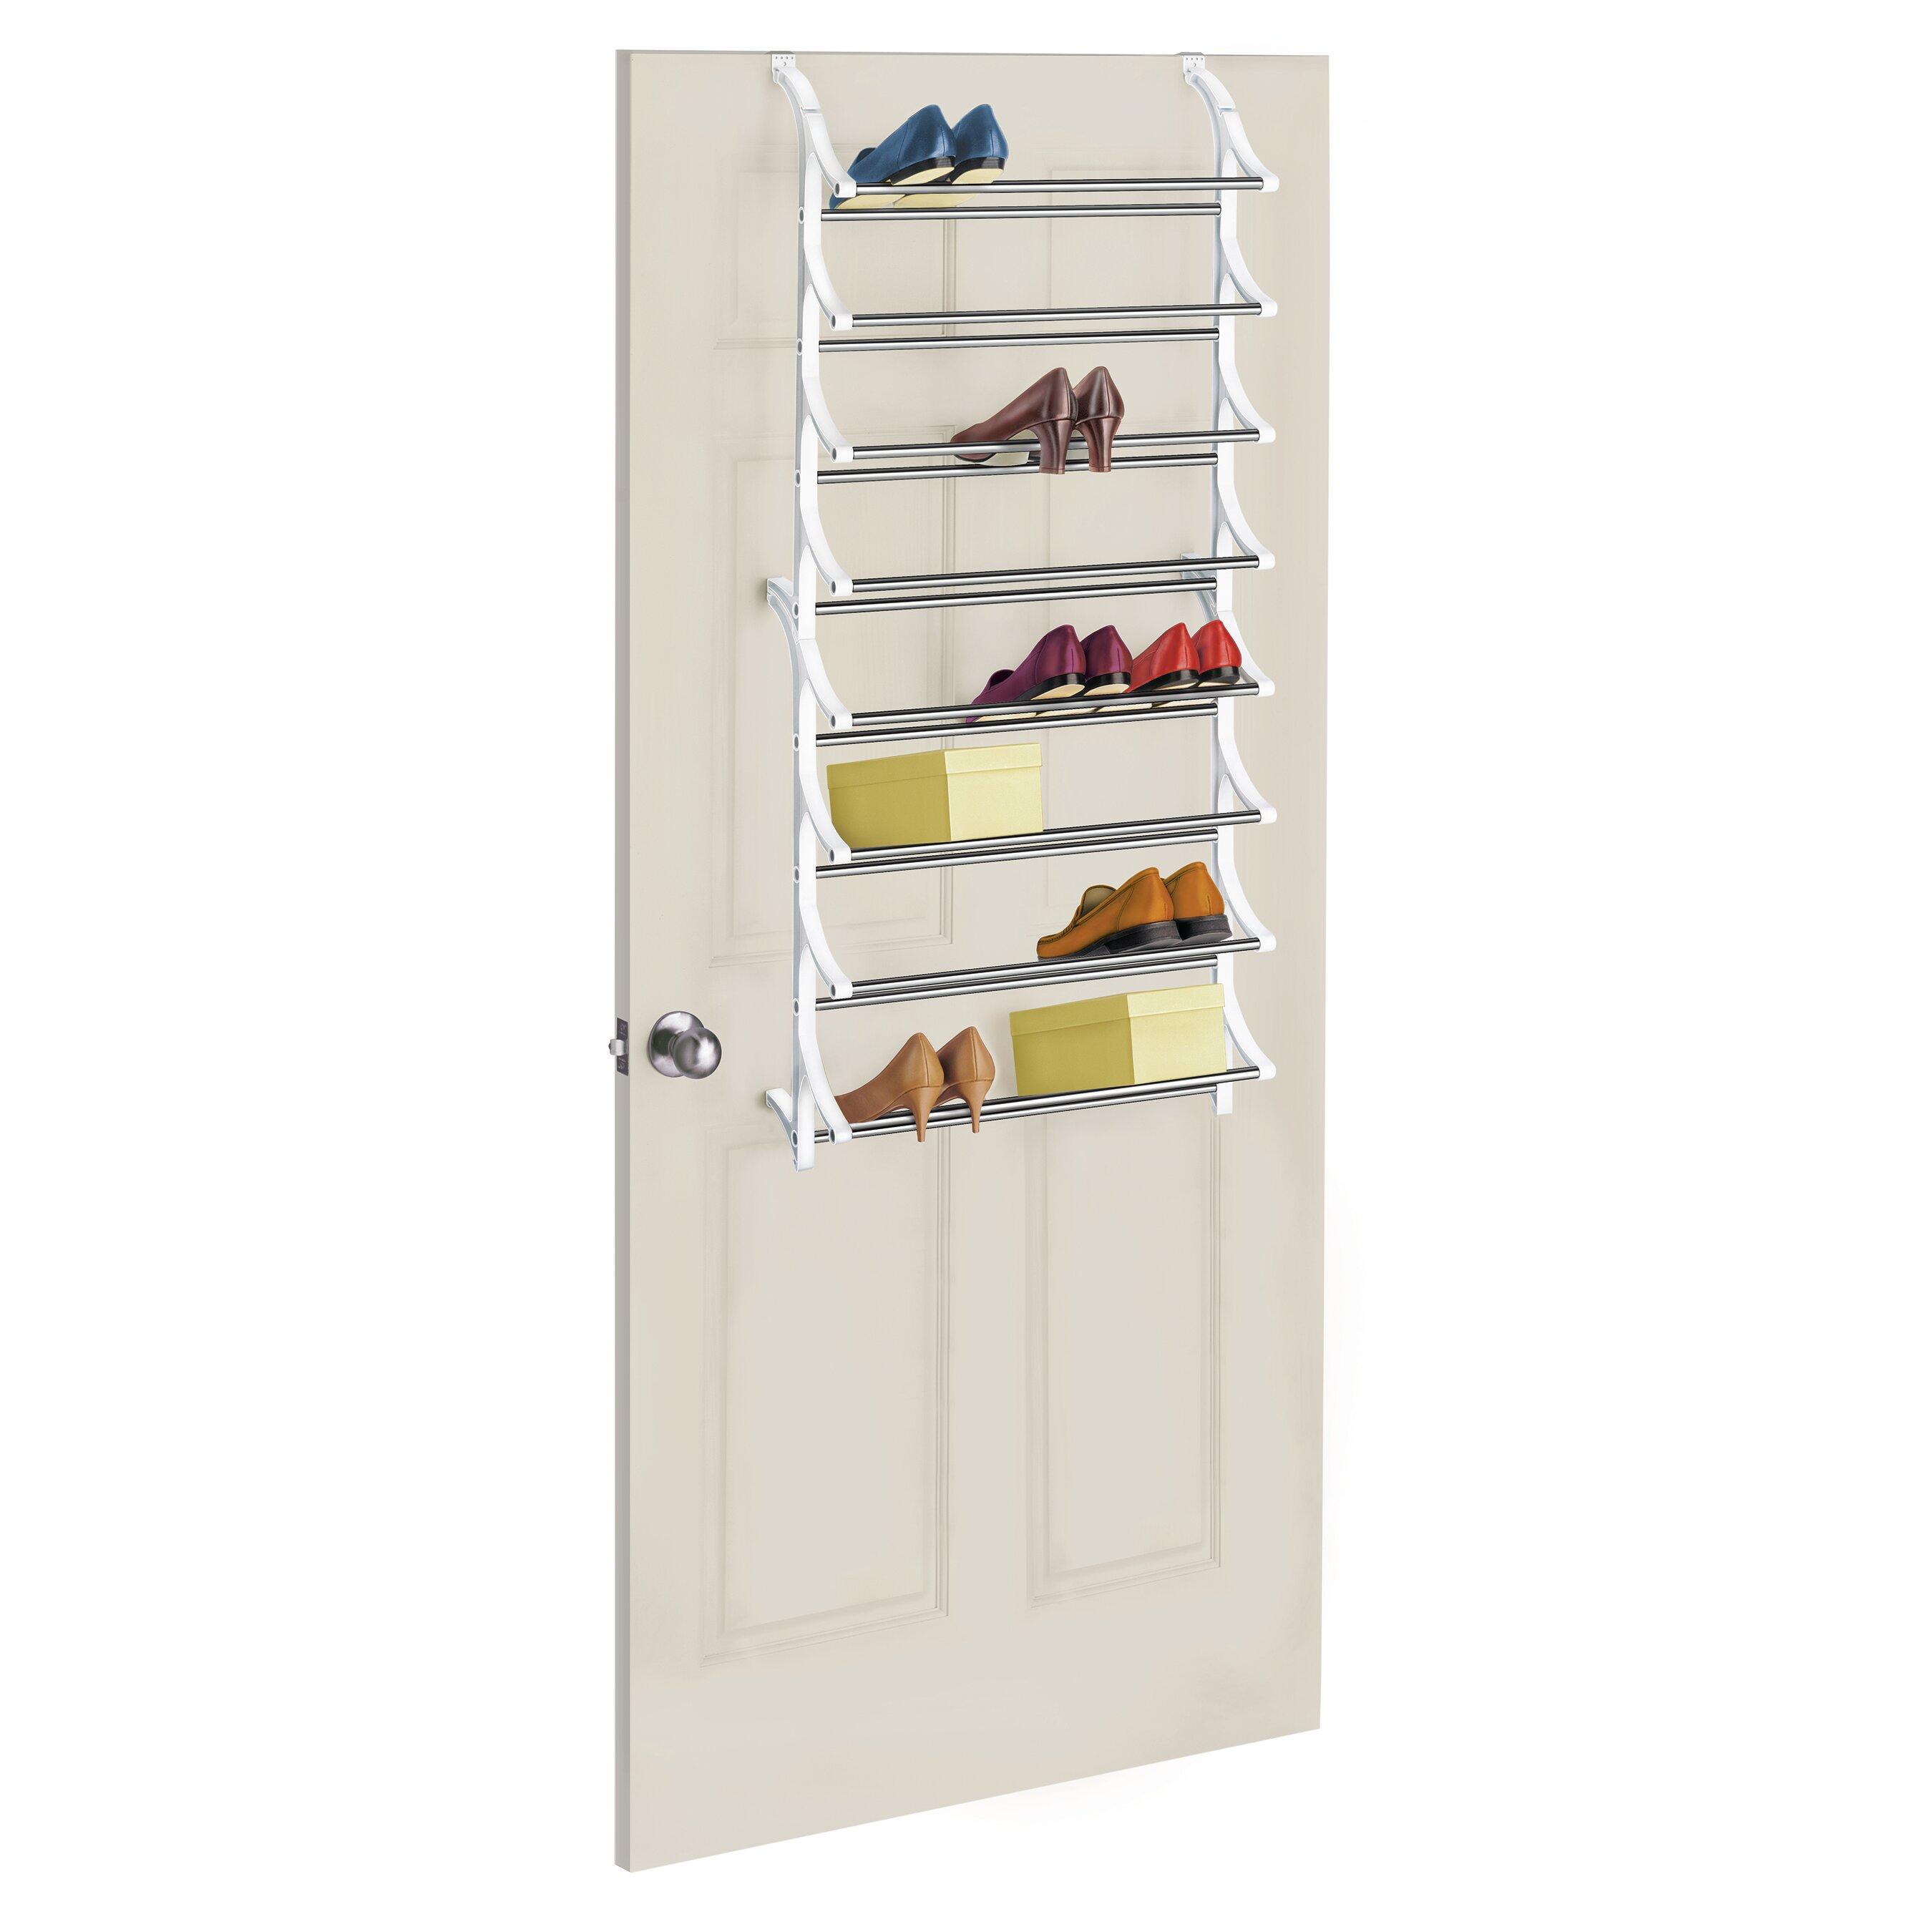 Merveilleux Lynk® 24 Pair Over Door Shoe Organizer